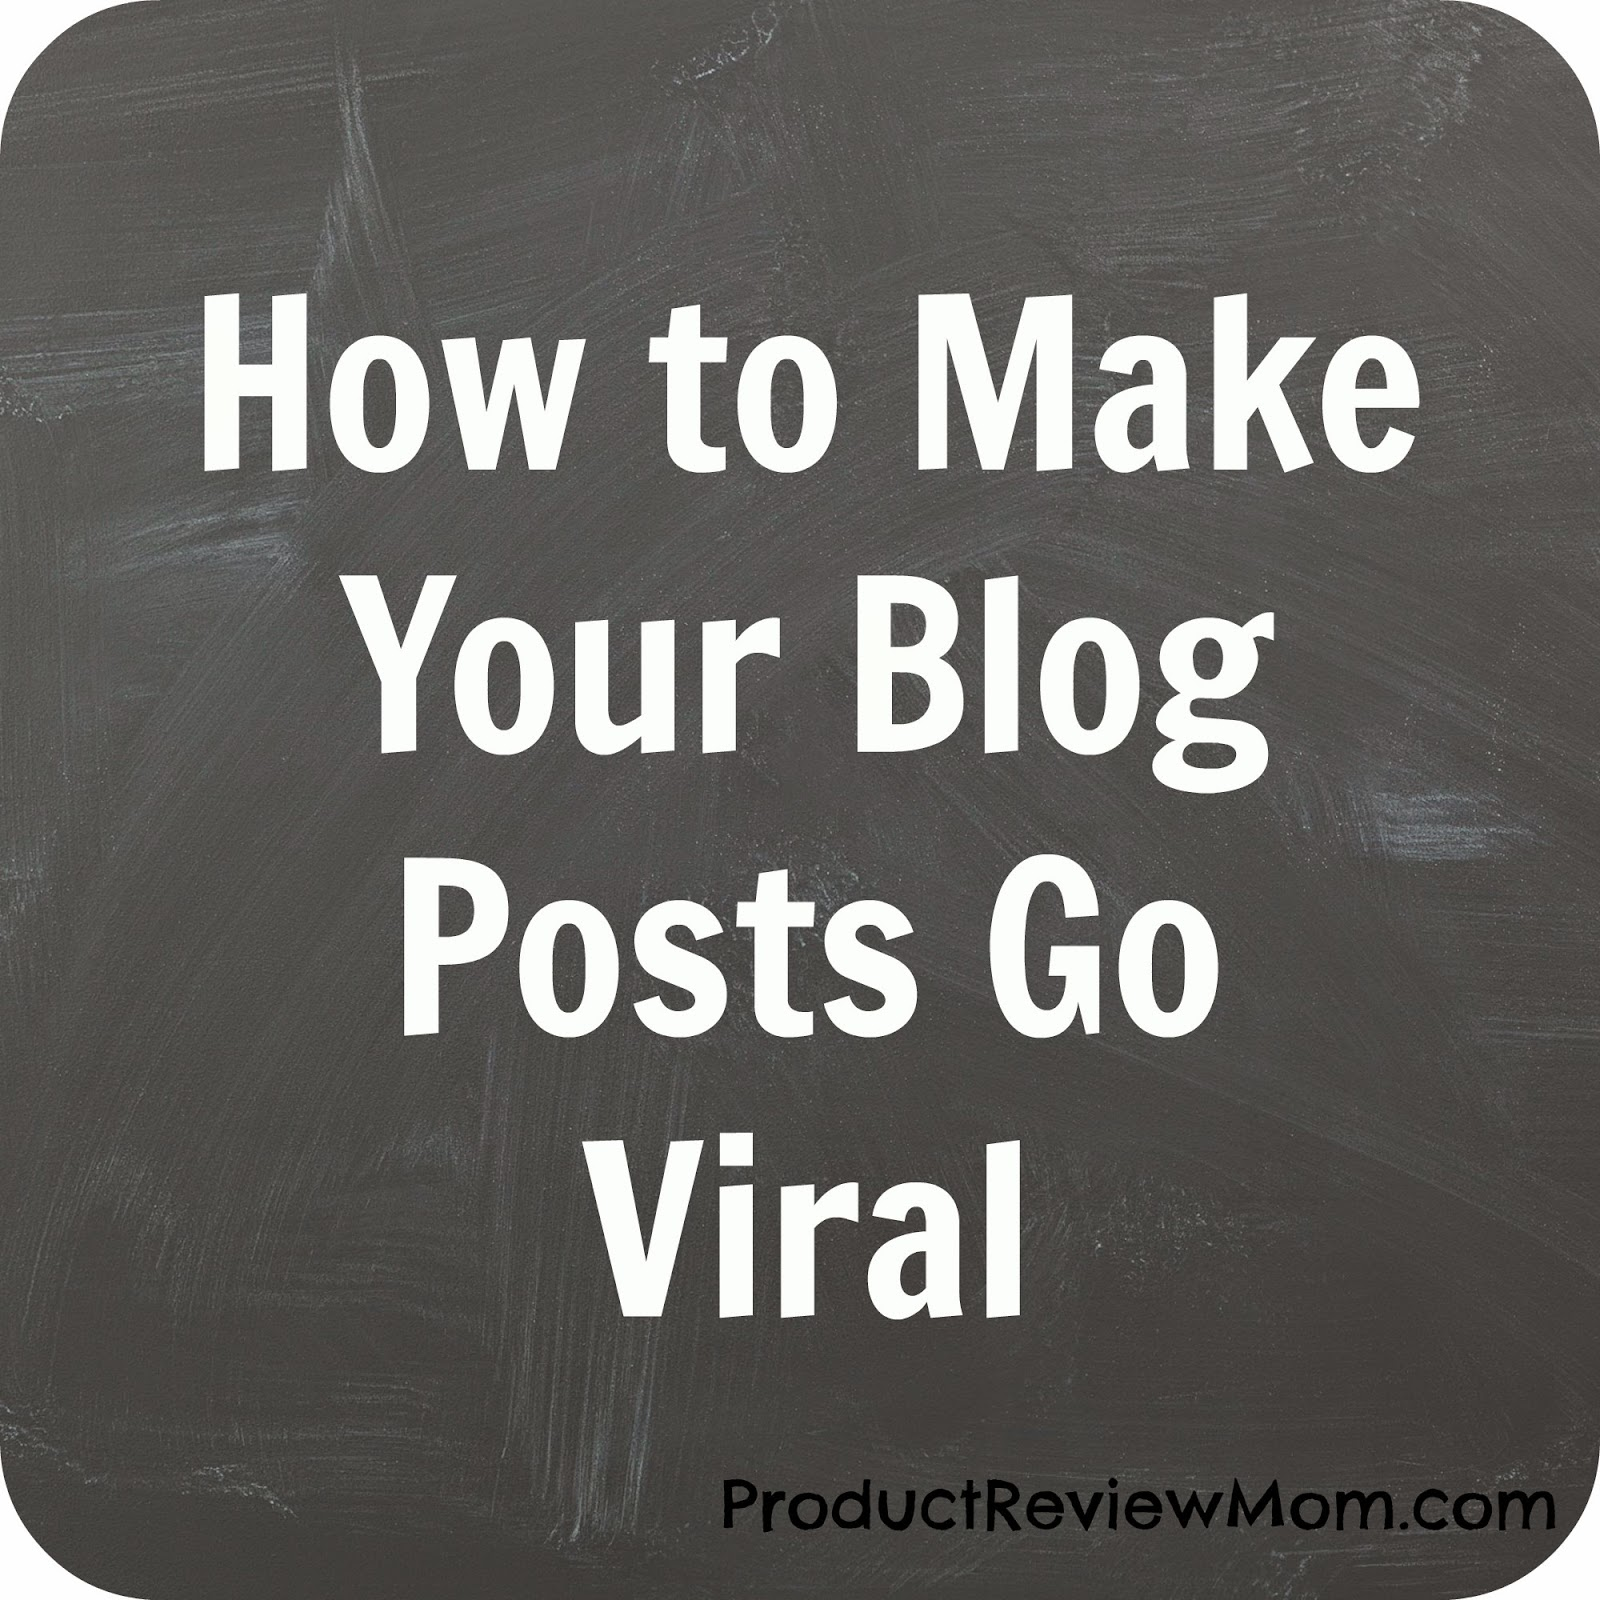 How to Make Your Blog Posts Go Viral  via www.productreviewmom.com